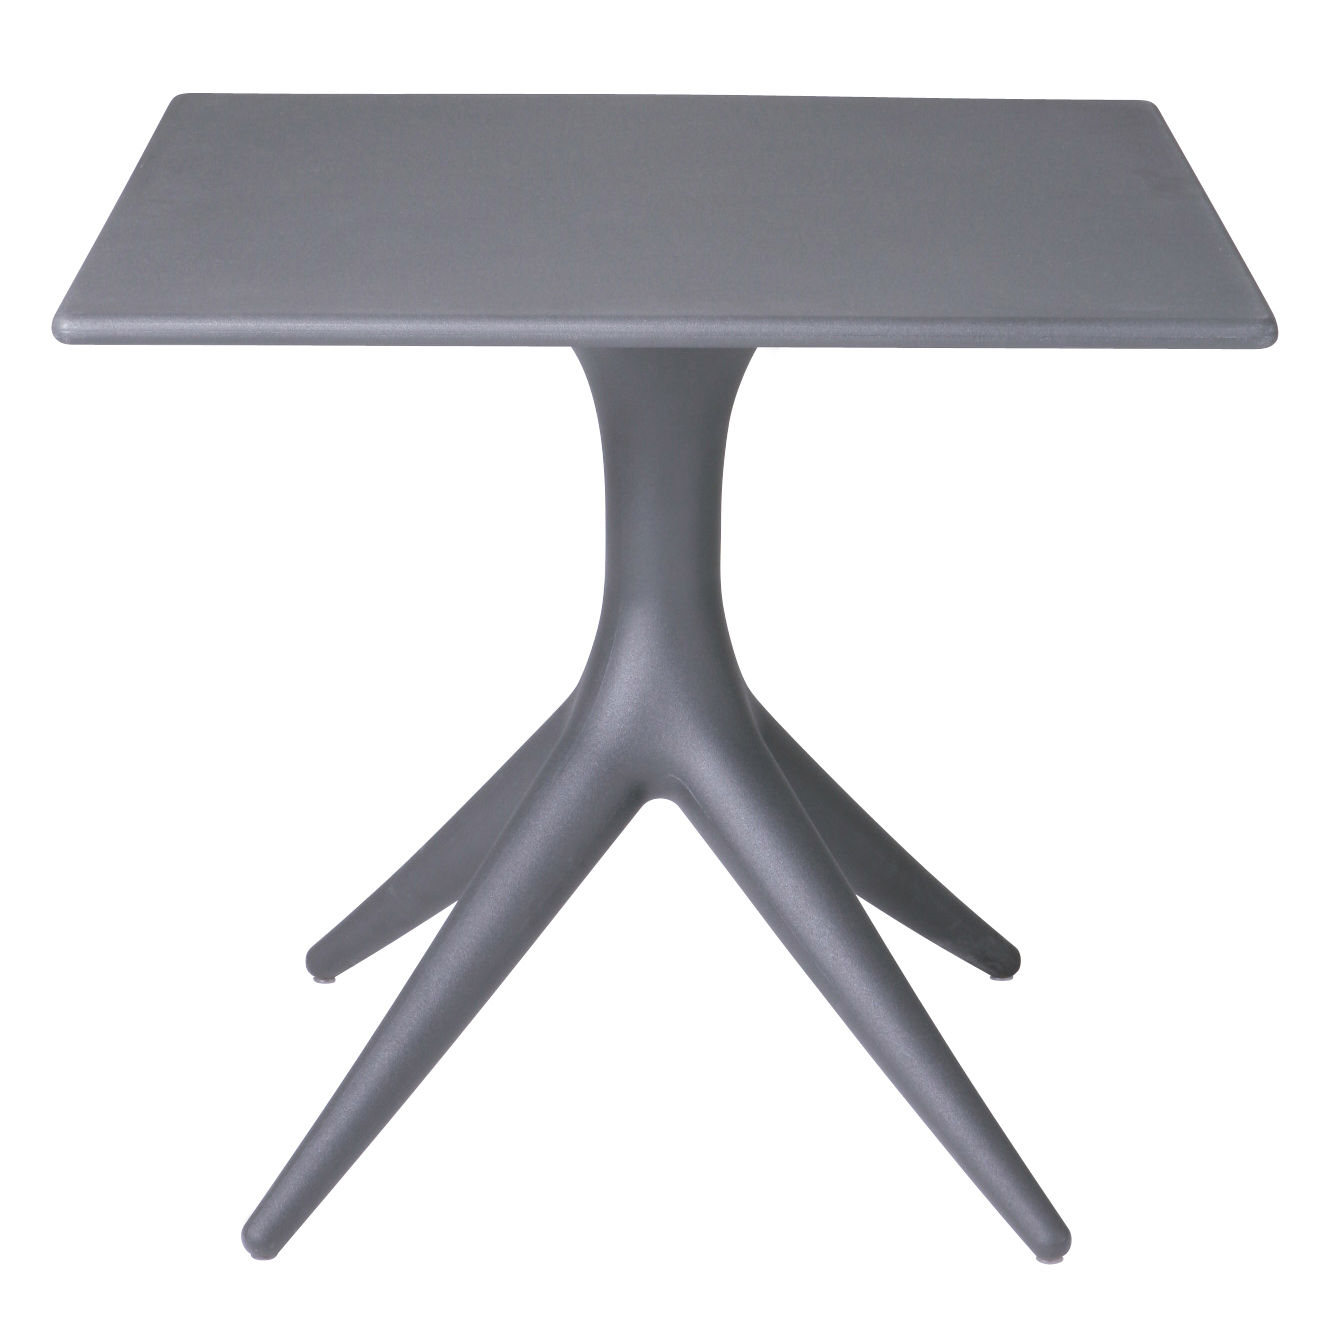 Jardin - Tables de jardin - Table App / 80 x 80 cm - Driade - Gris anthracite - Polyéthylène rotomoulé